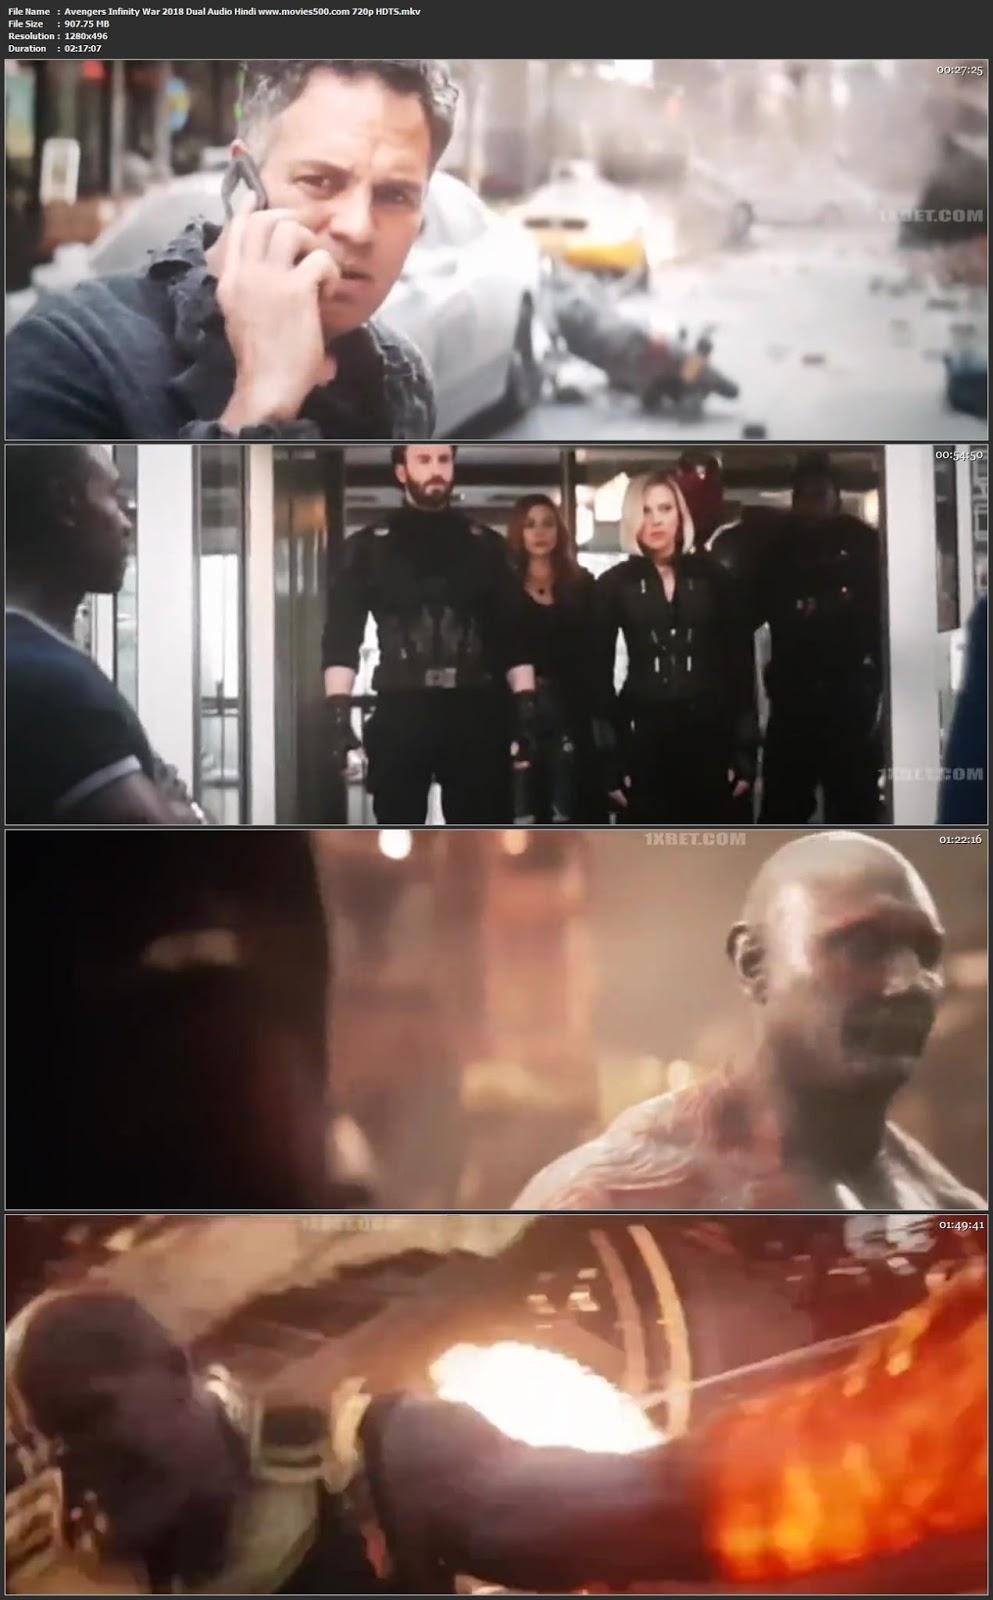 Avengers Infinity War 2018 Hindi Dubbed 300MB HDTSRip 480p at movies500.site